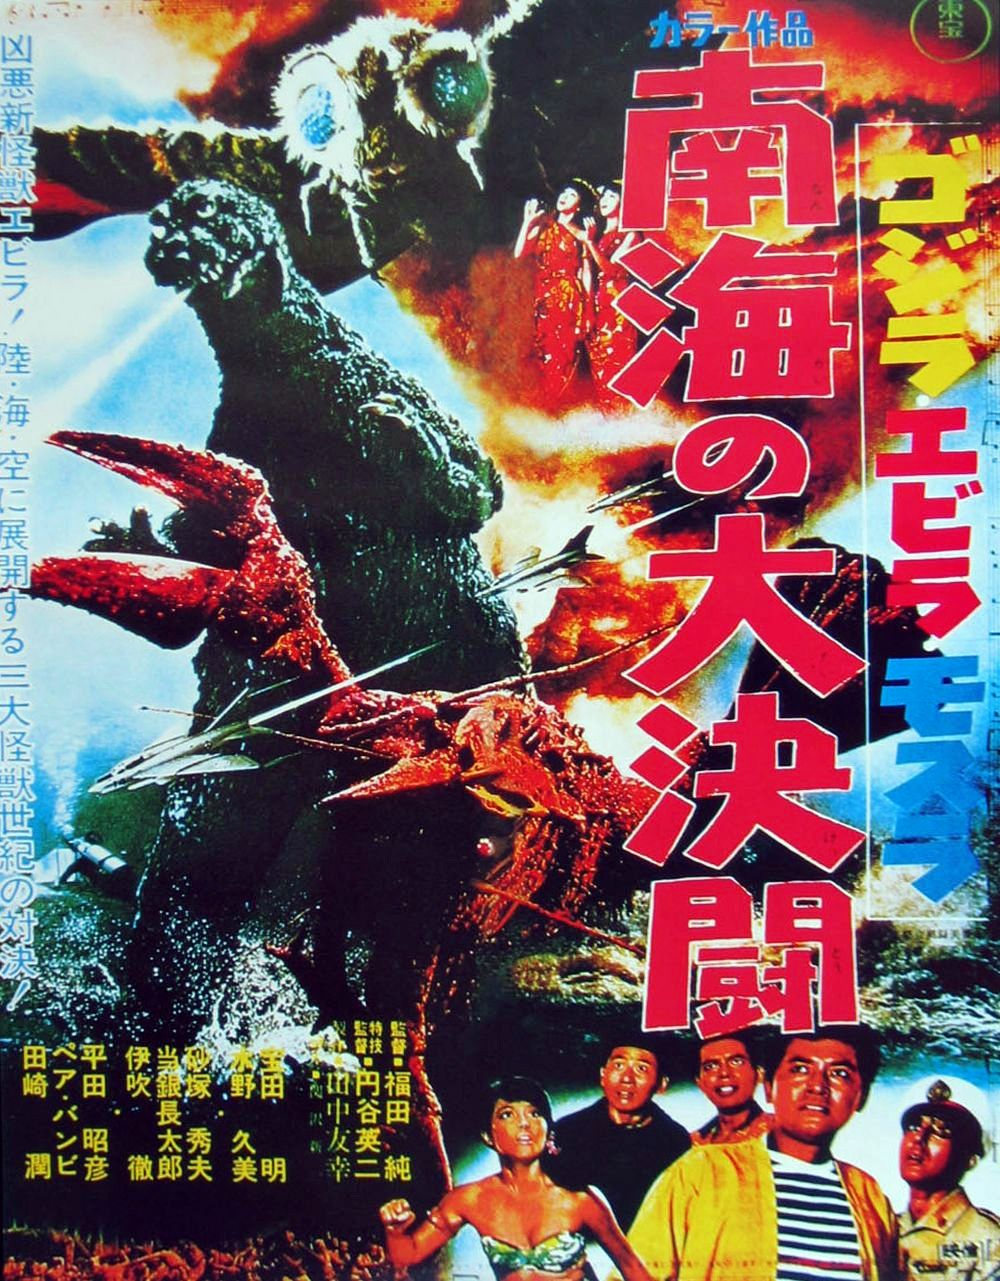 Godzilla Vs. The Sea Monster 8